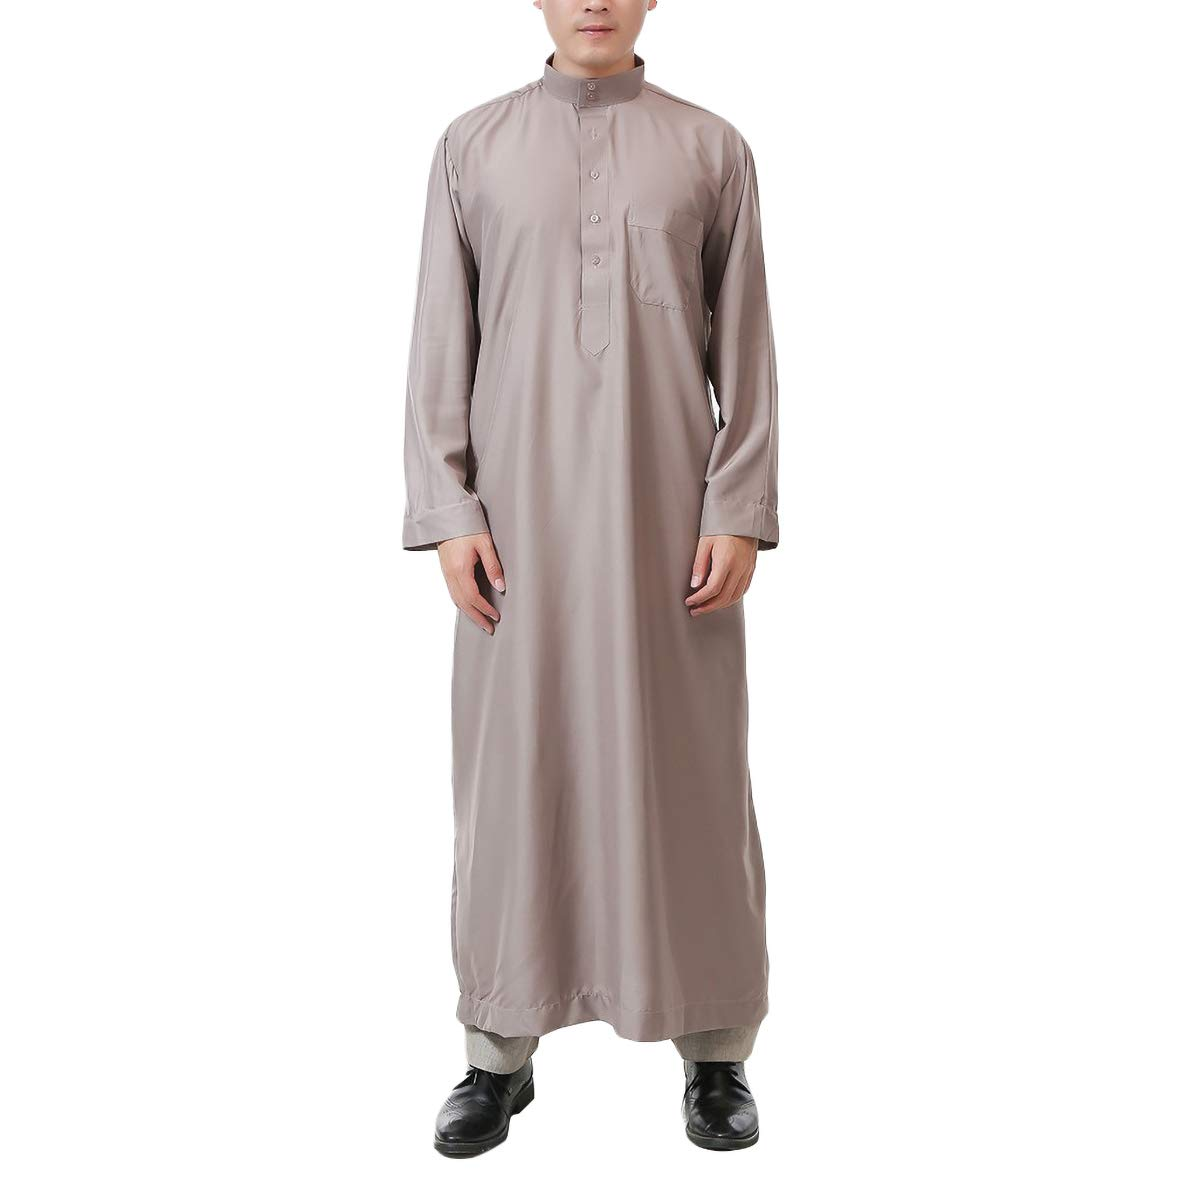 Acqrobe Musulman Abaya Thobe Homme Robe Arabe Caftan /à Manches Longues Dishdasha Turquie